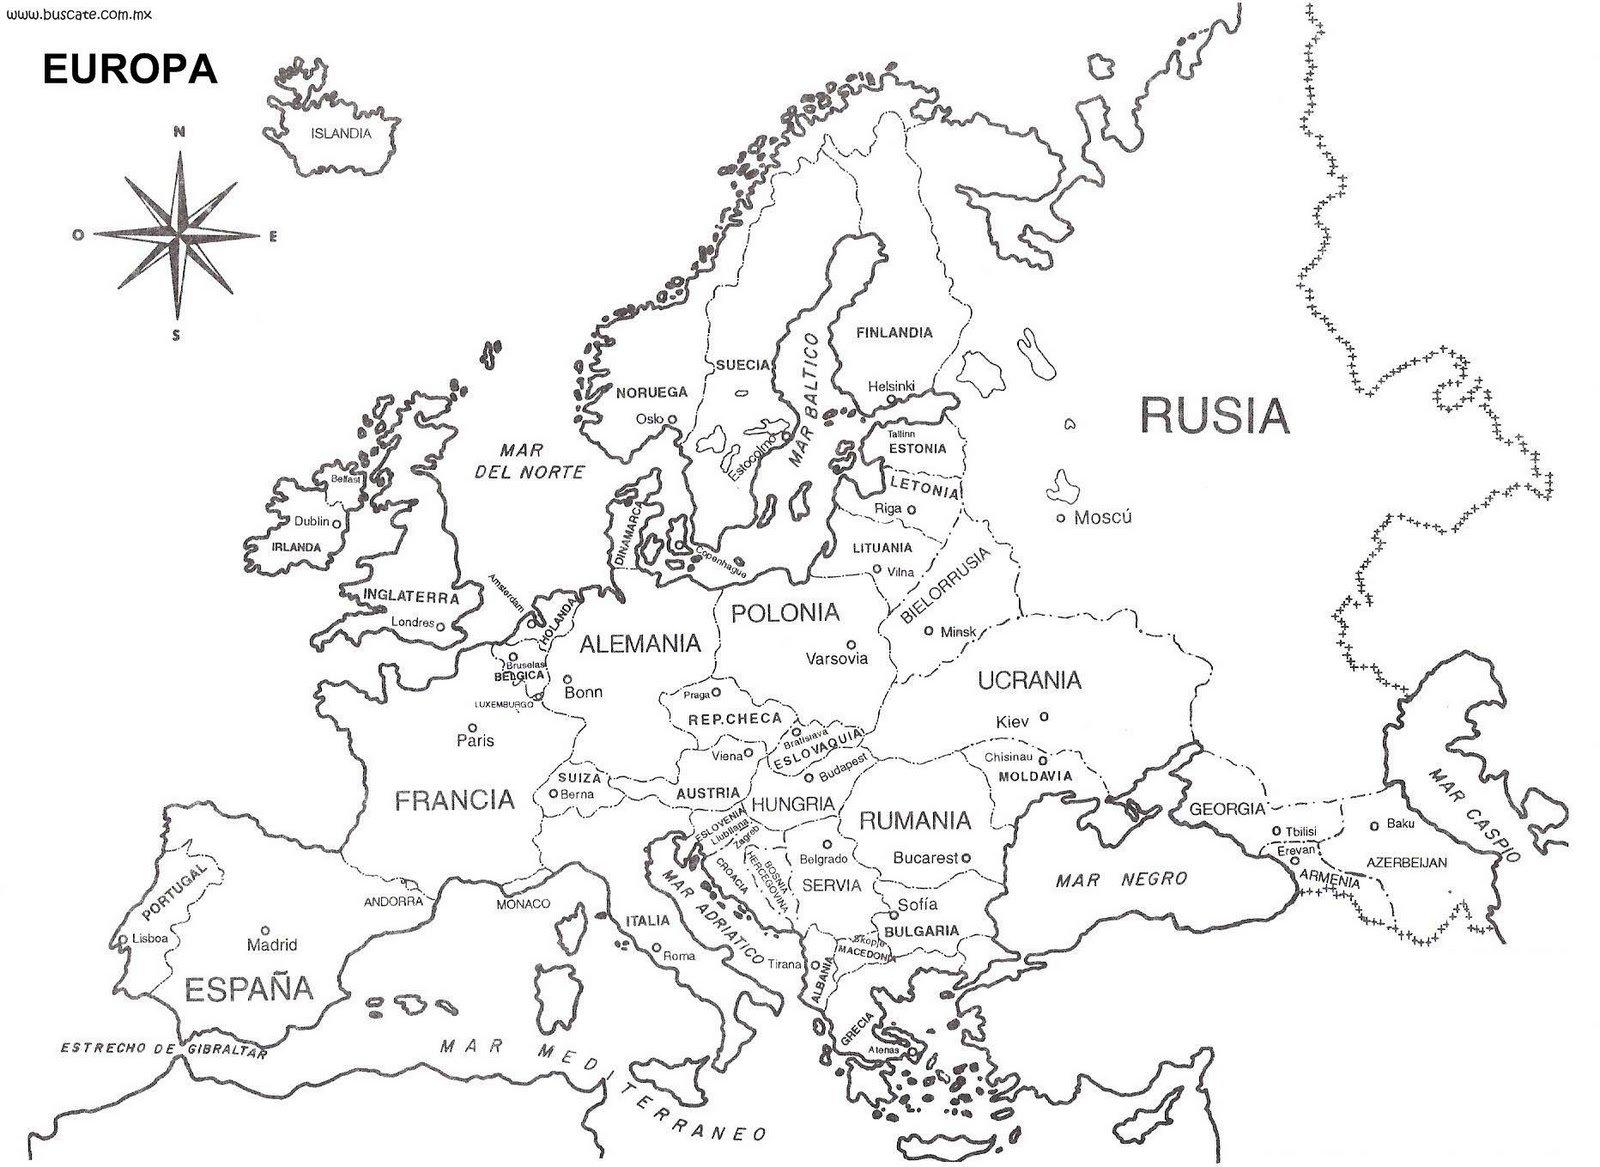 best Imagenes De Mapa De Europa Para Pintar image collection